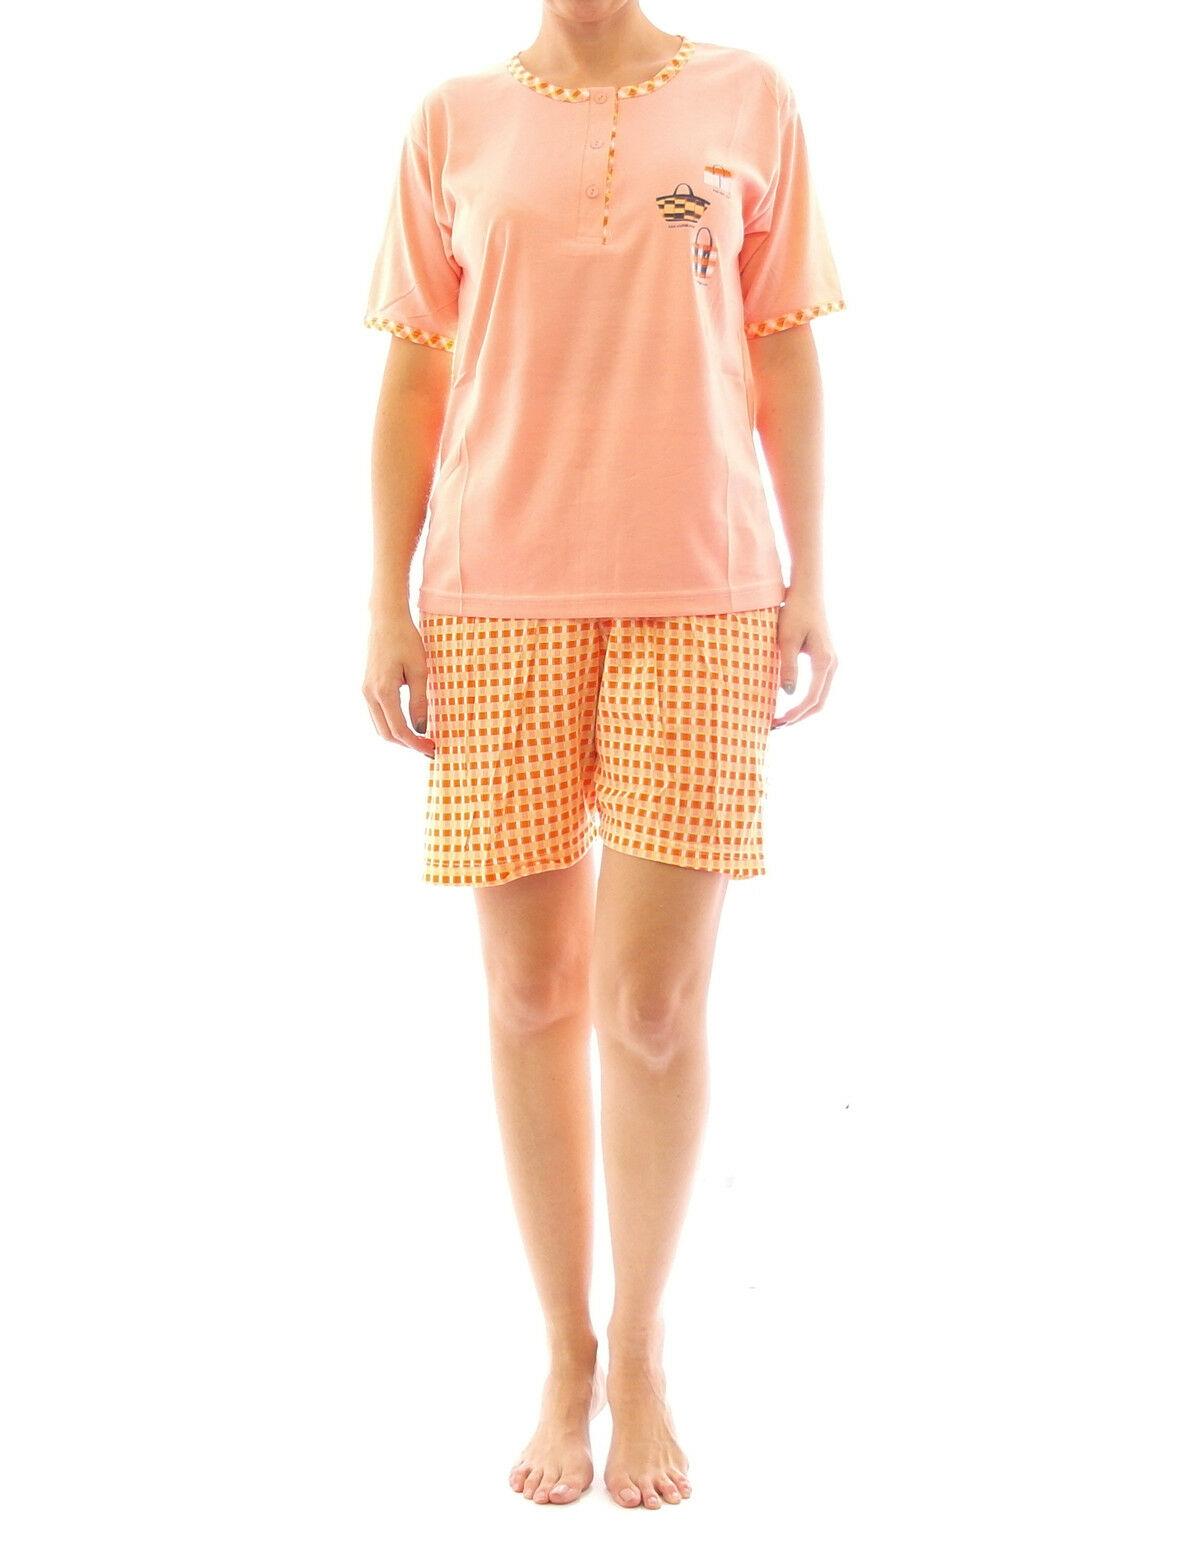 competitive price 17517 7378d Damen Pyjama Schlafanzug Top Shirt Kurzarm kurze Shorts Motiv Matysio